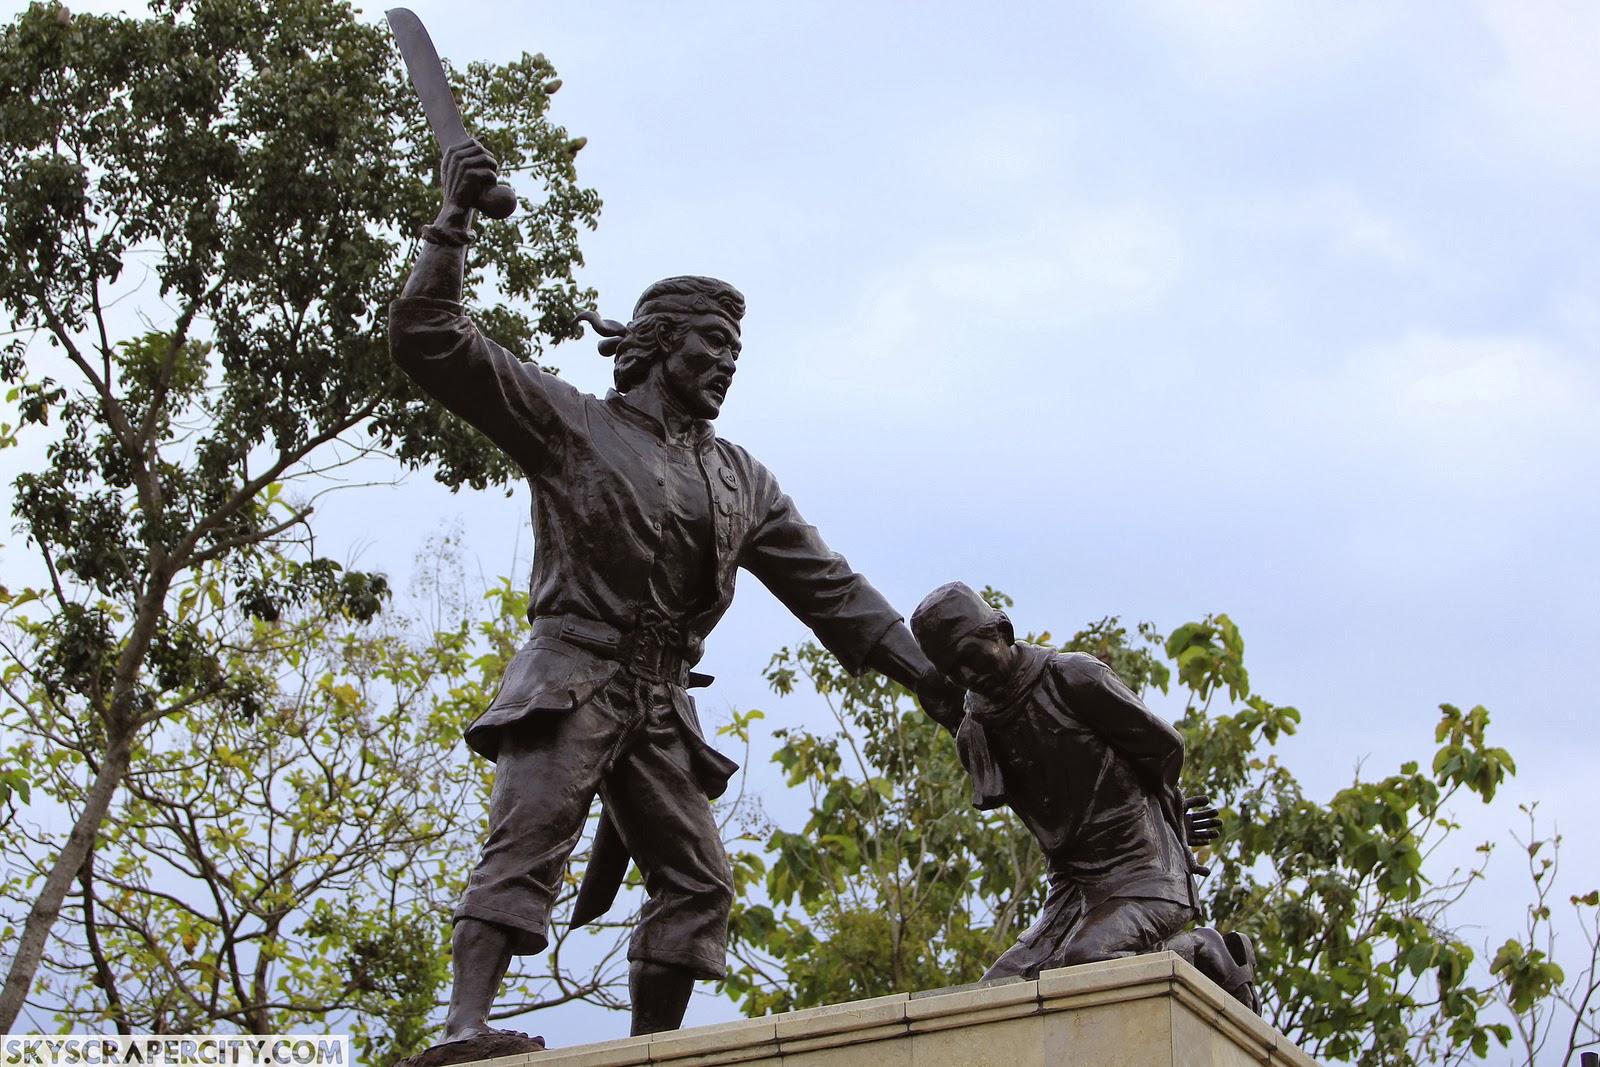 Yuk Wisata Sejarah Monumen Kresek Prasasti Pengingat Kekejaman Pki Madiun